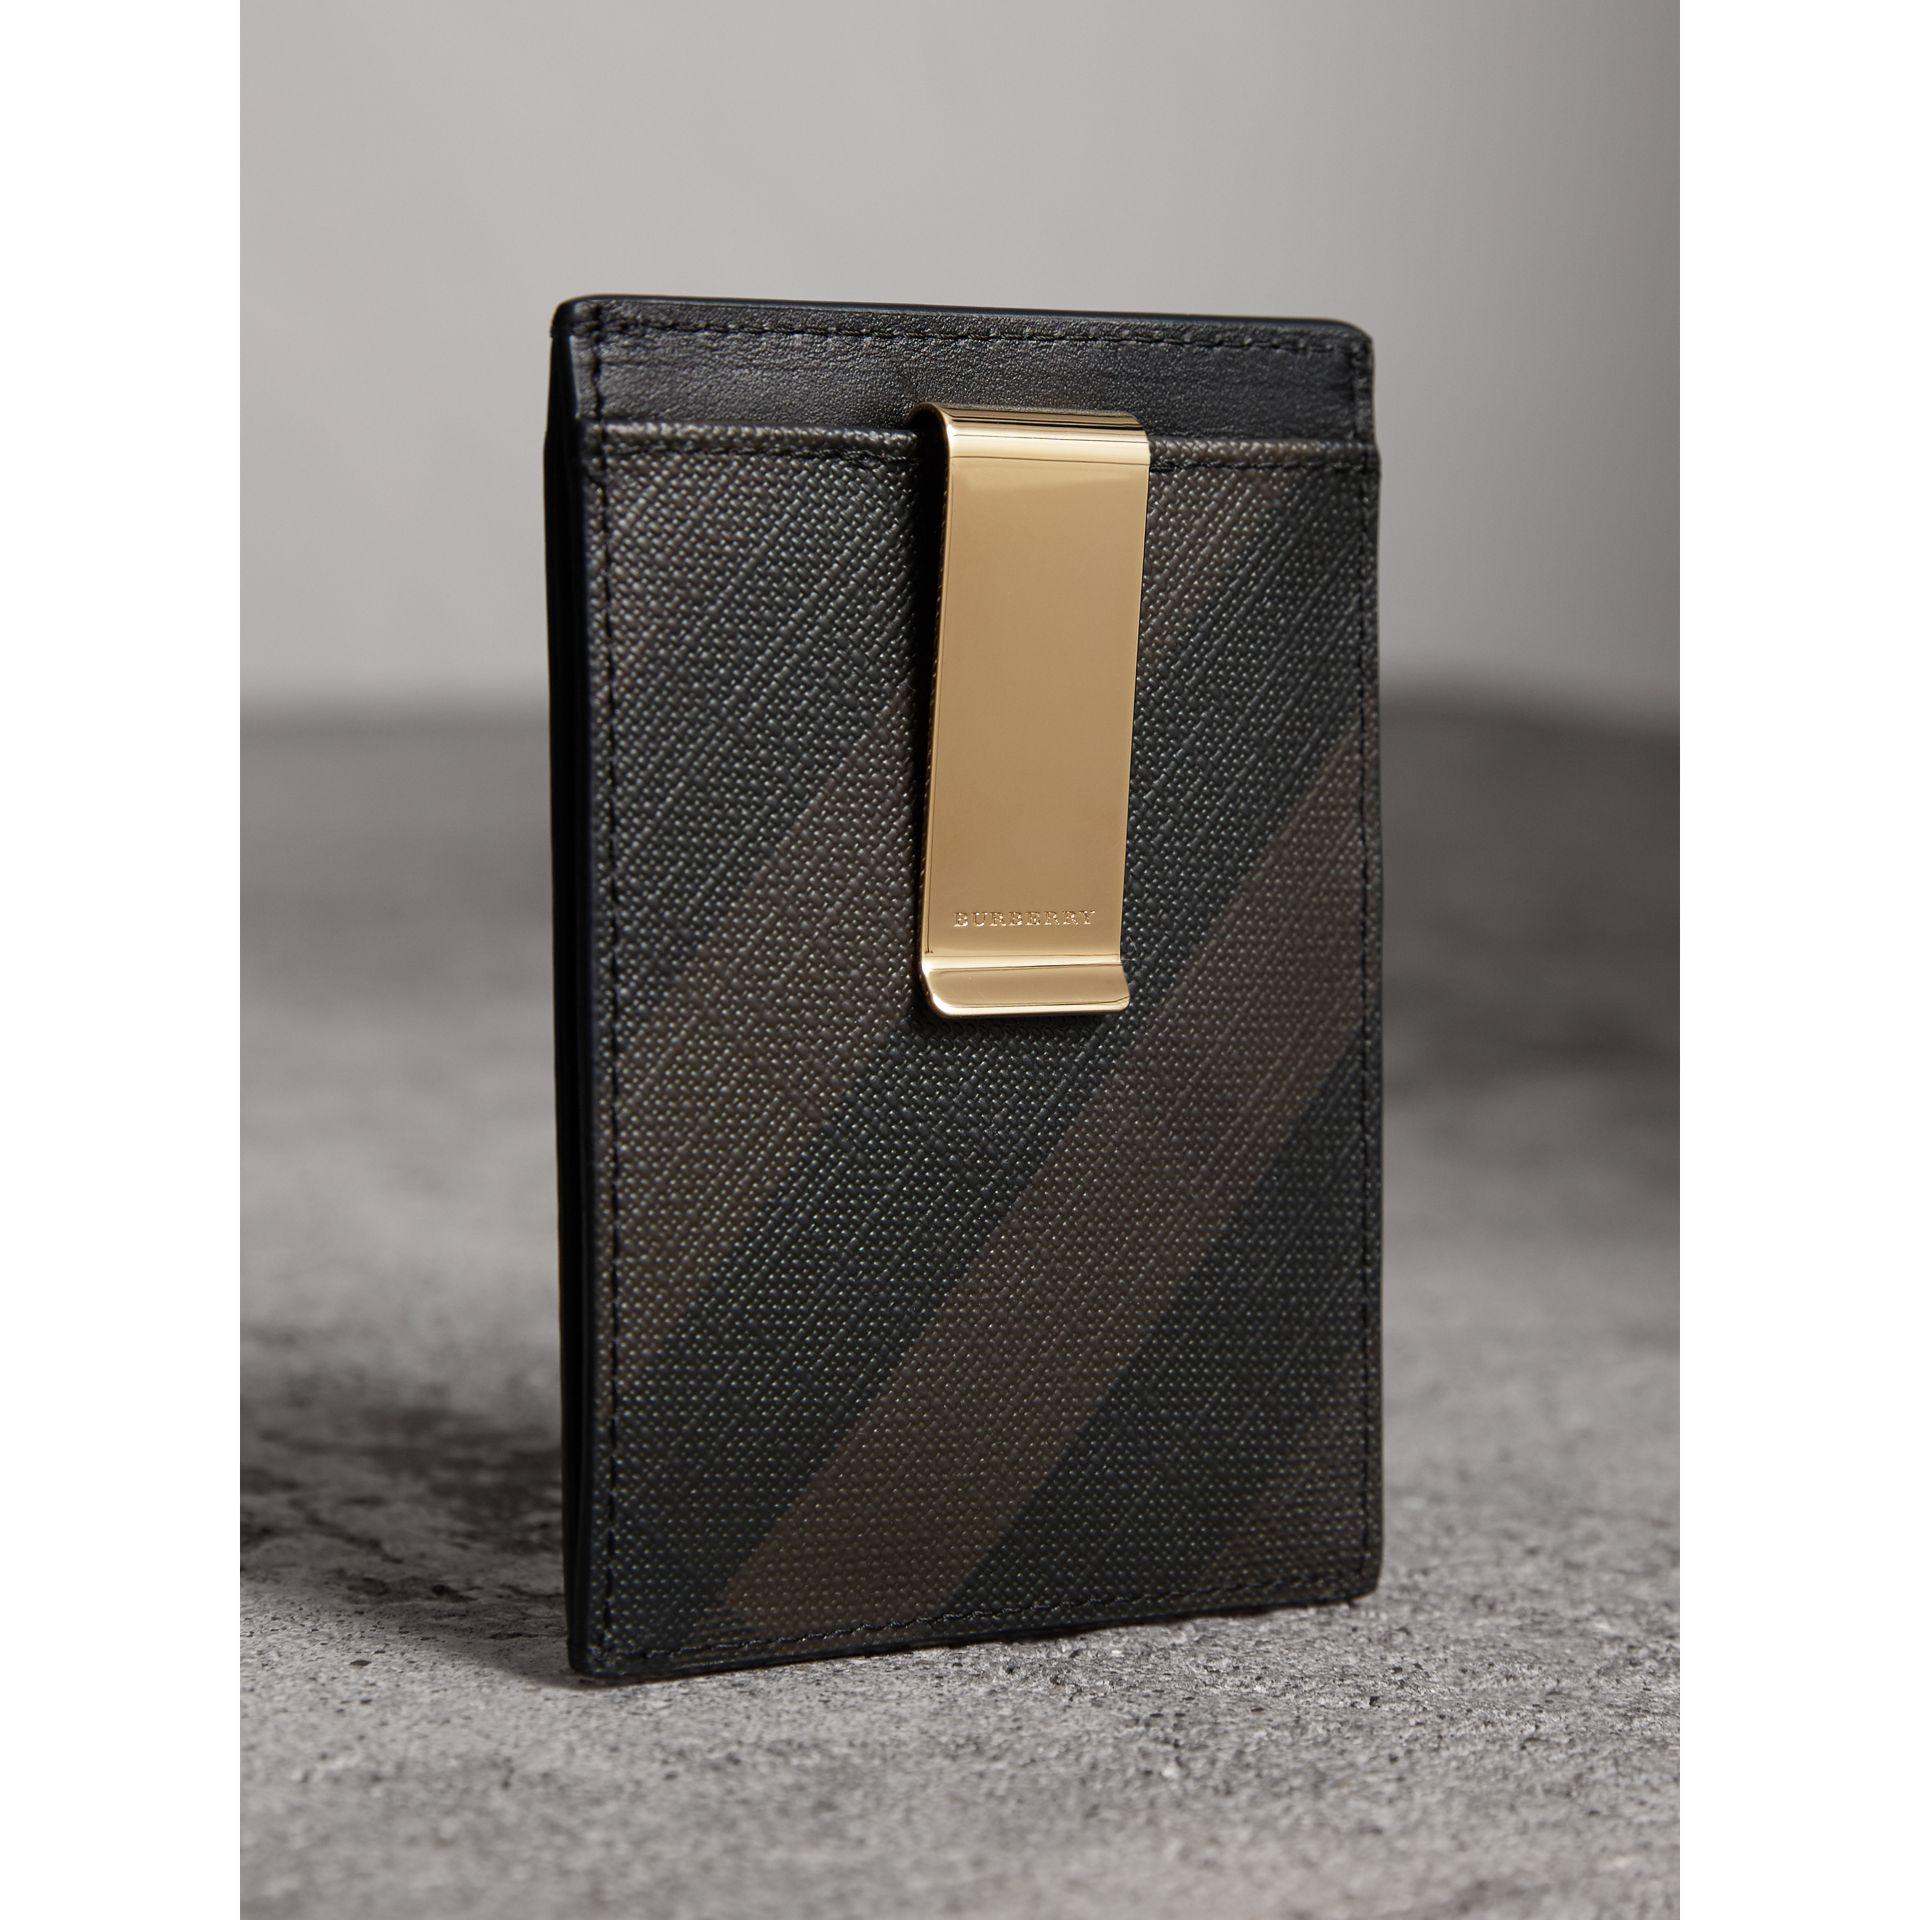 free shipping fde84 d0a70 Burberry Brown London Check Money Clip Card Case Chocolate/black for men